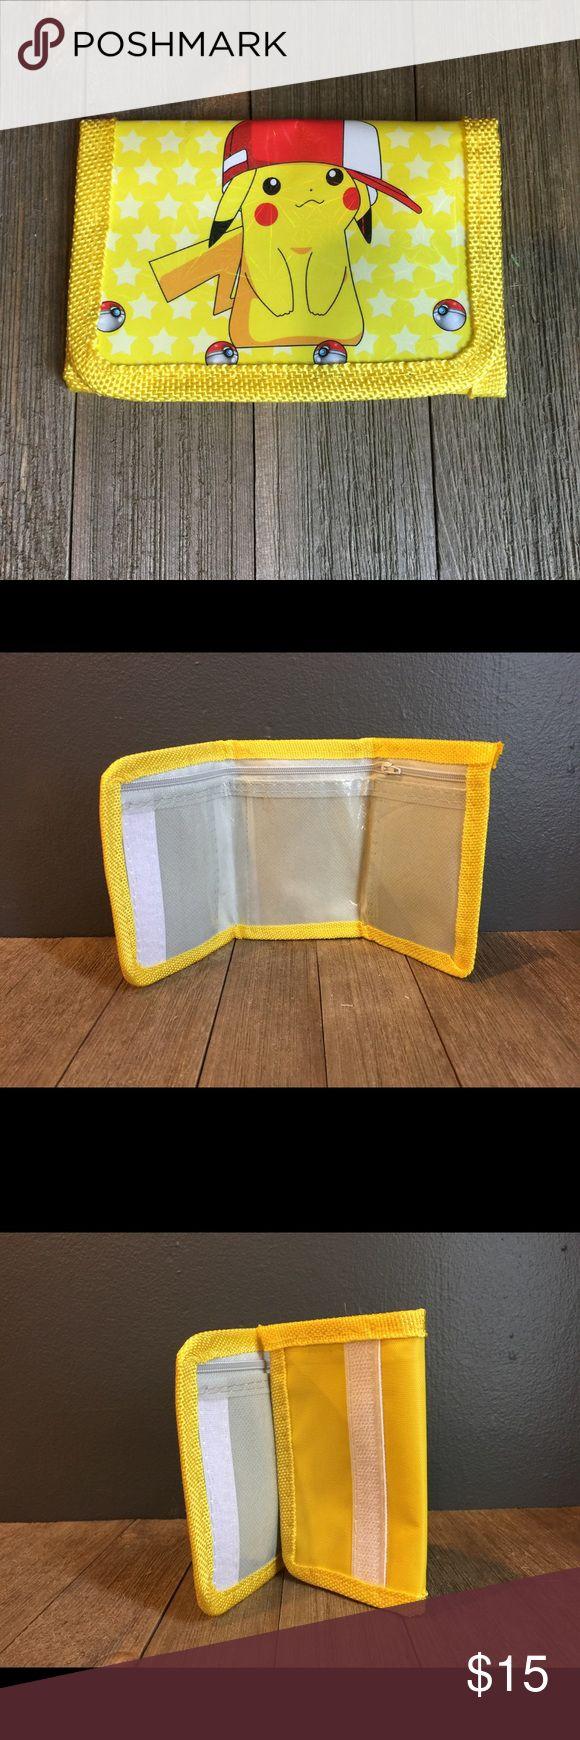 Pokemon wallet New for kids pokemon wallet, imported. Pokemon Accessories Key & Card Holders